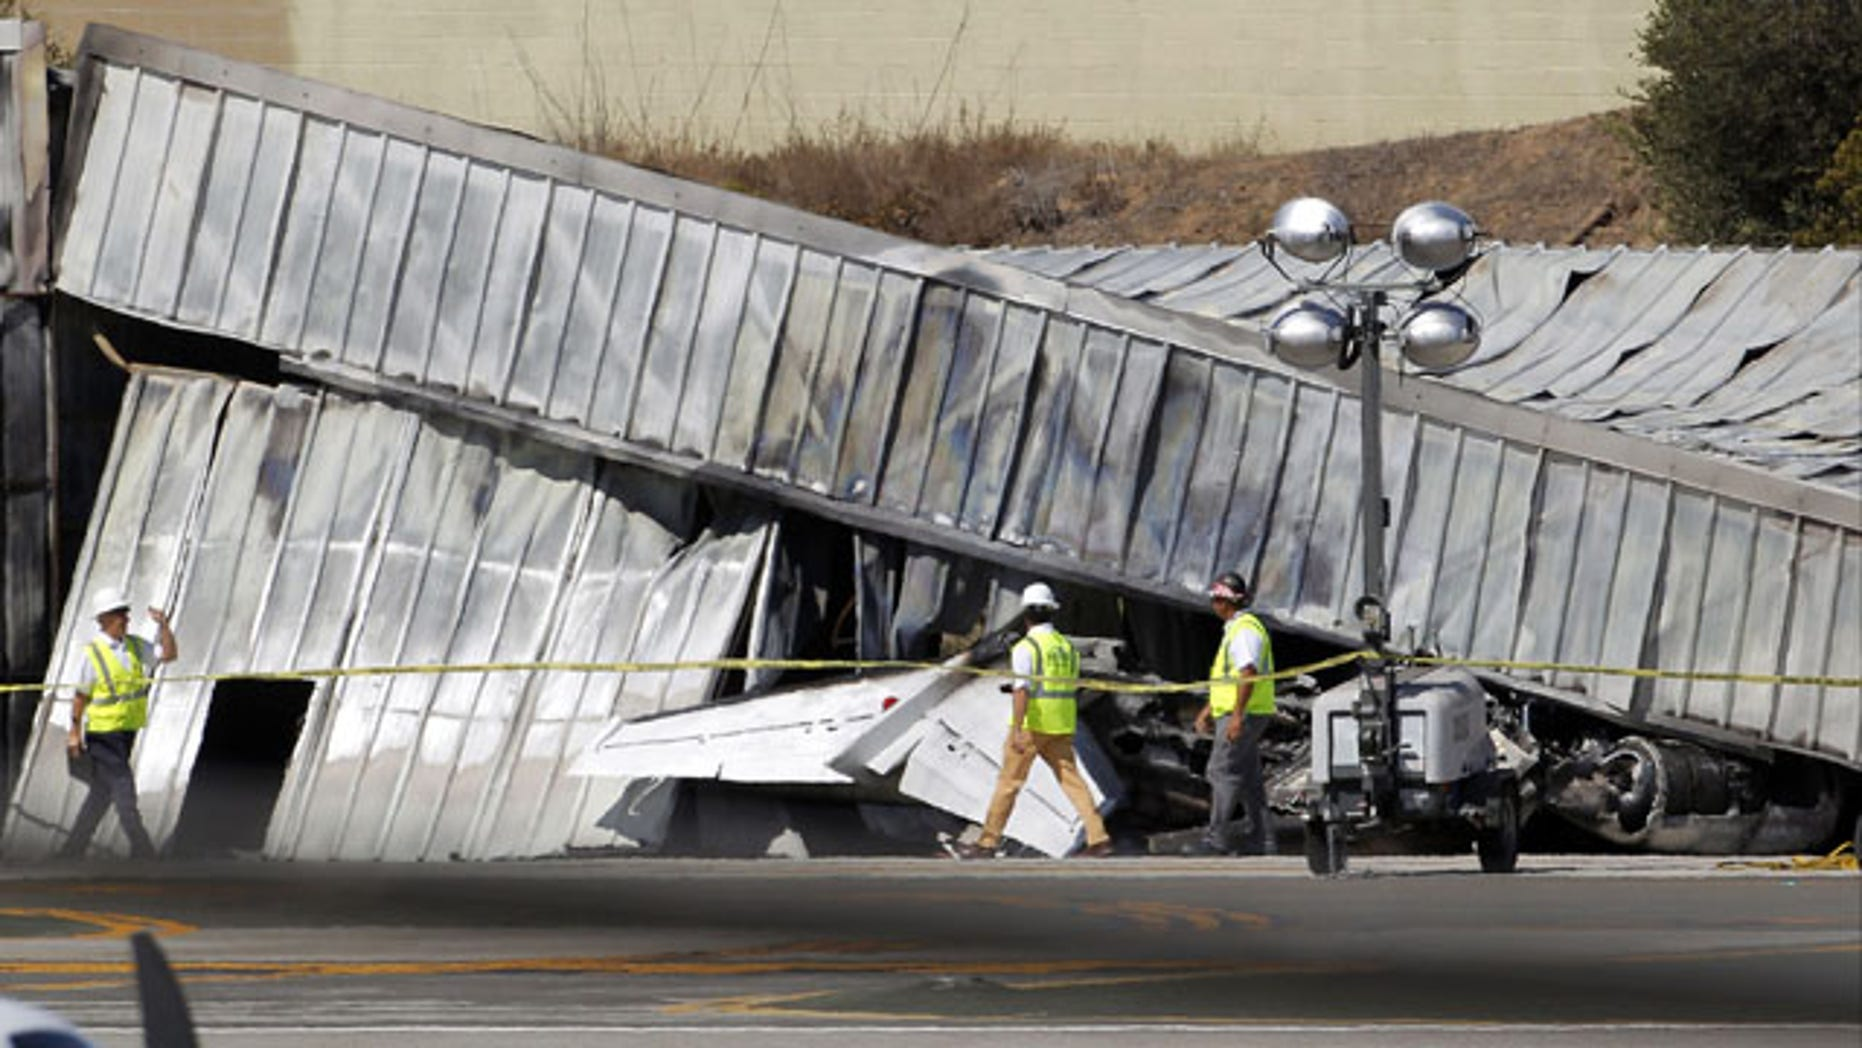 September 30, 2013: Investigators stand near a hangar at the site of a plane crash in Santa Monica, Calif. Monday. (AP Photo)